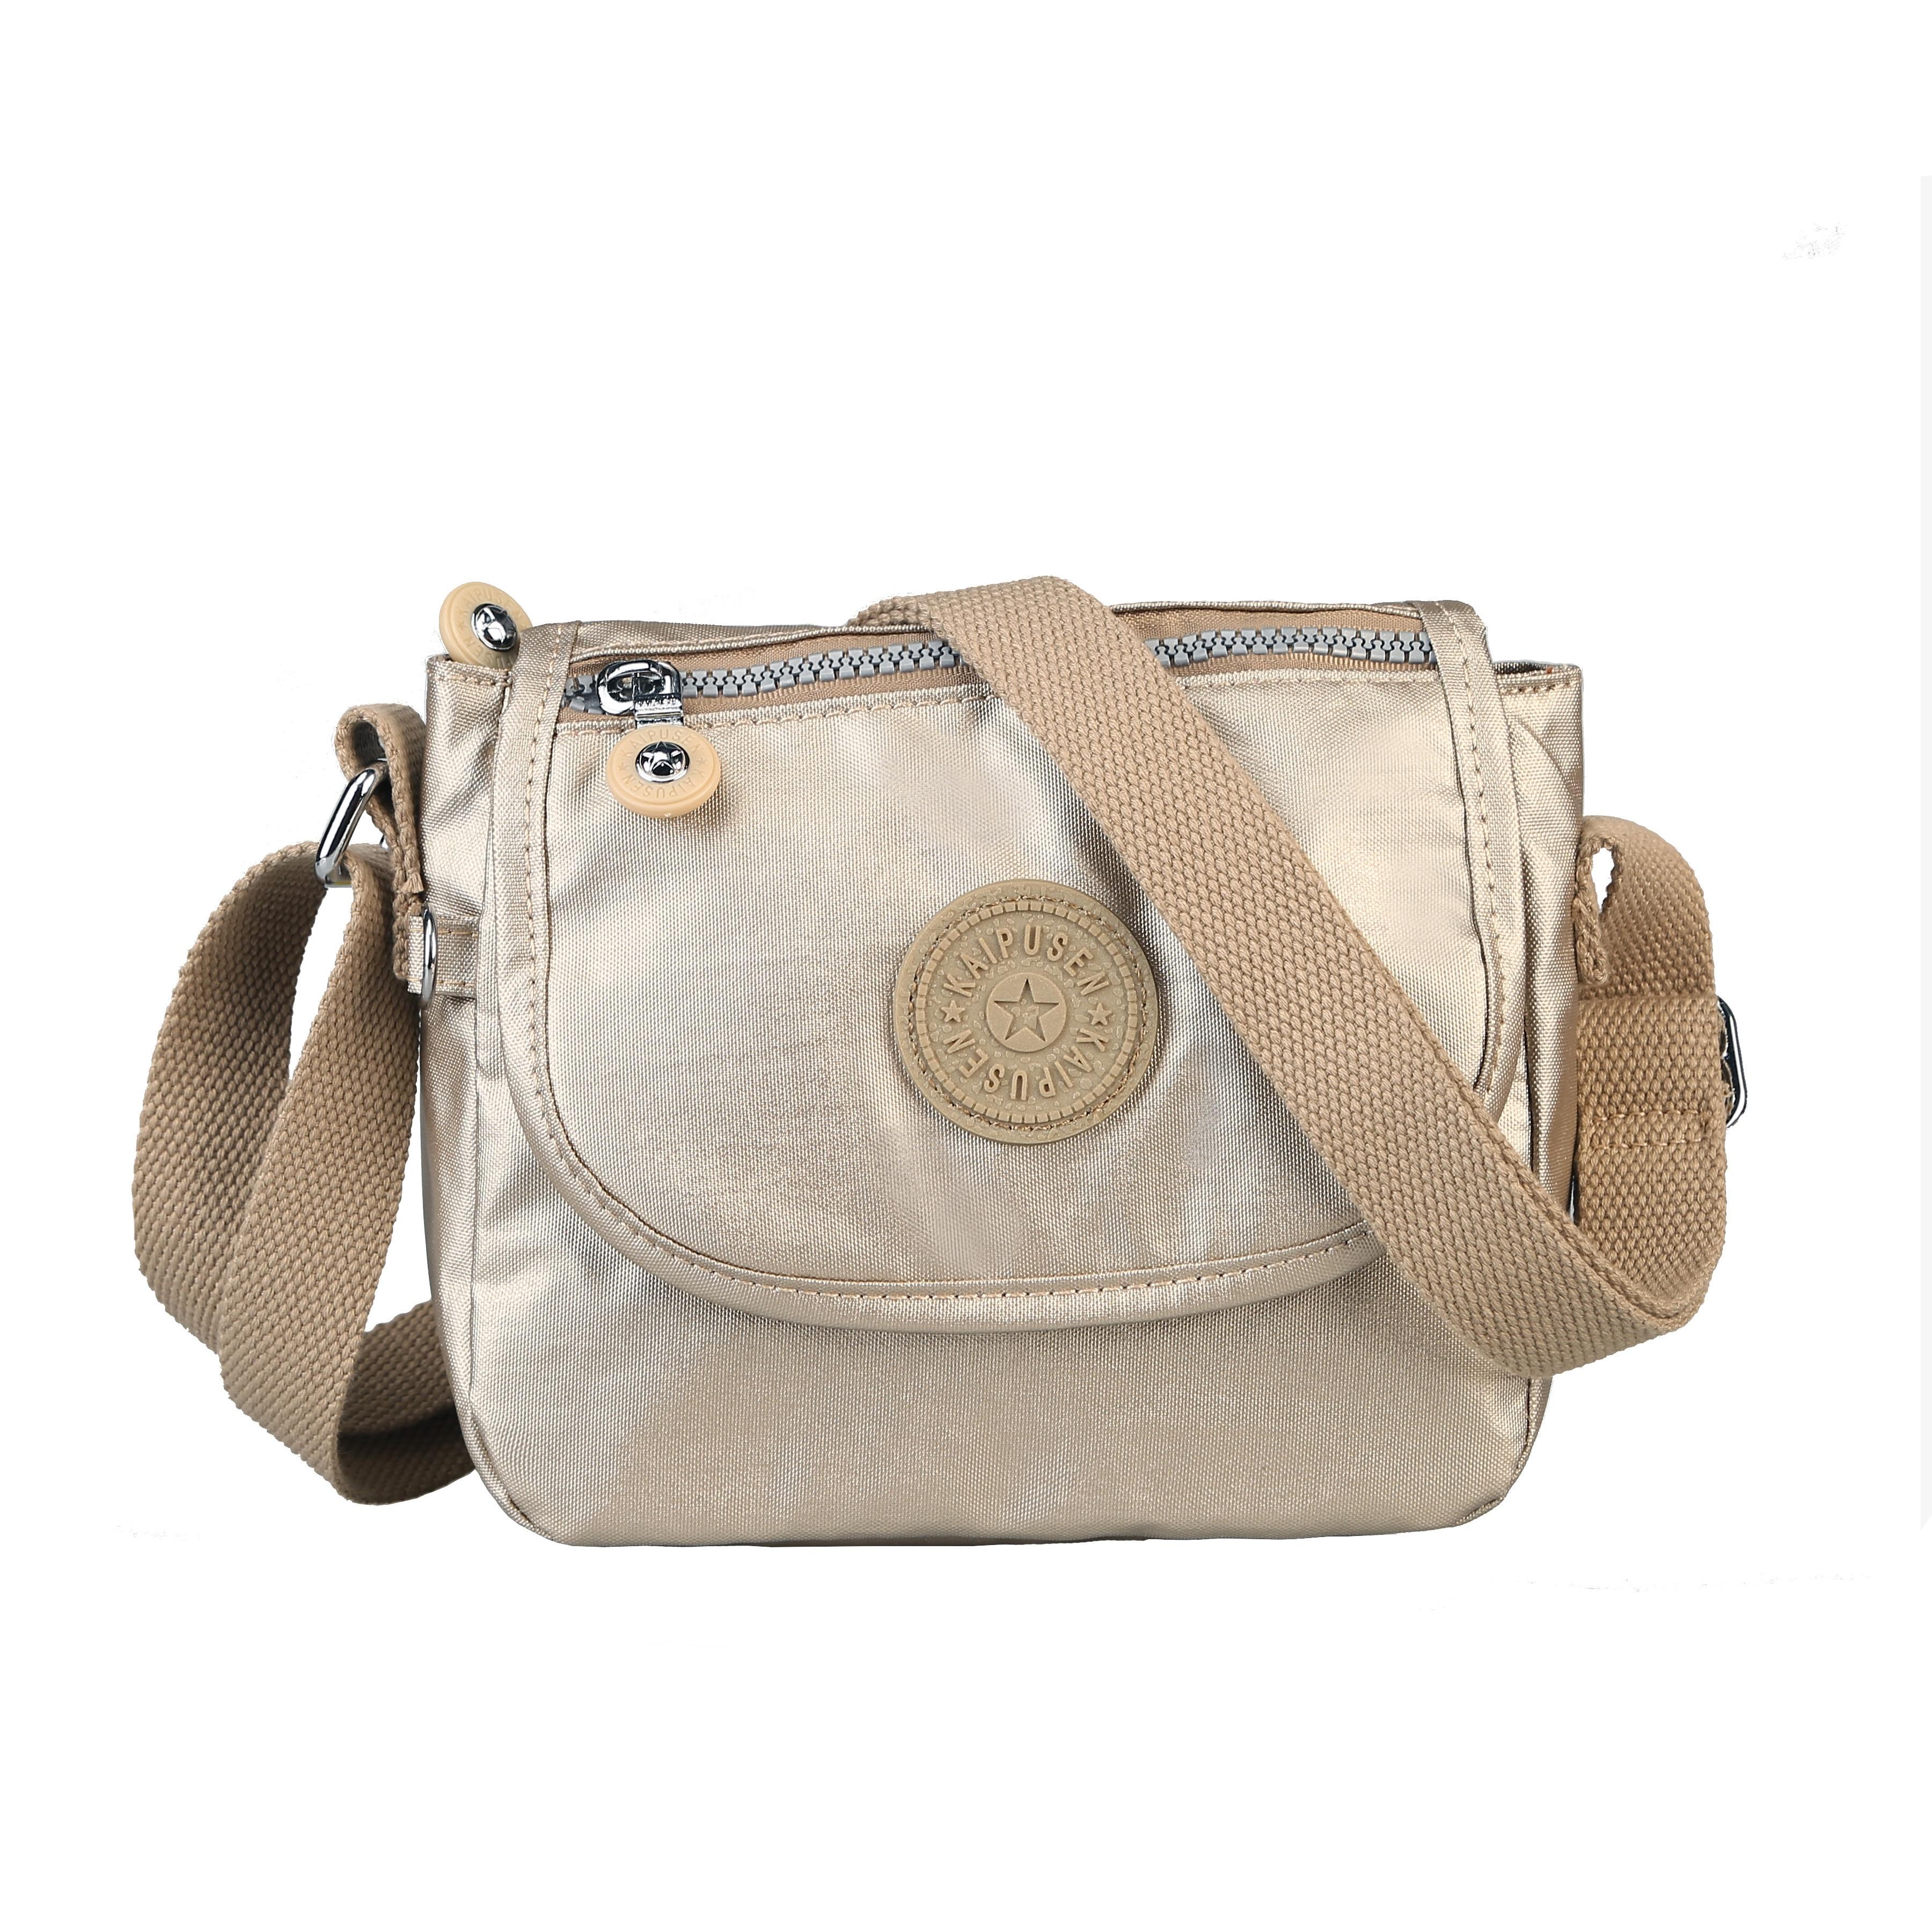 KEDANISON Fashion Waterproof Woman Messenger Bag